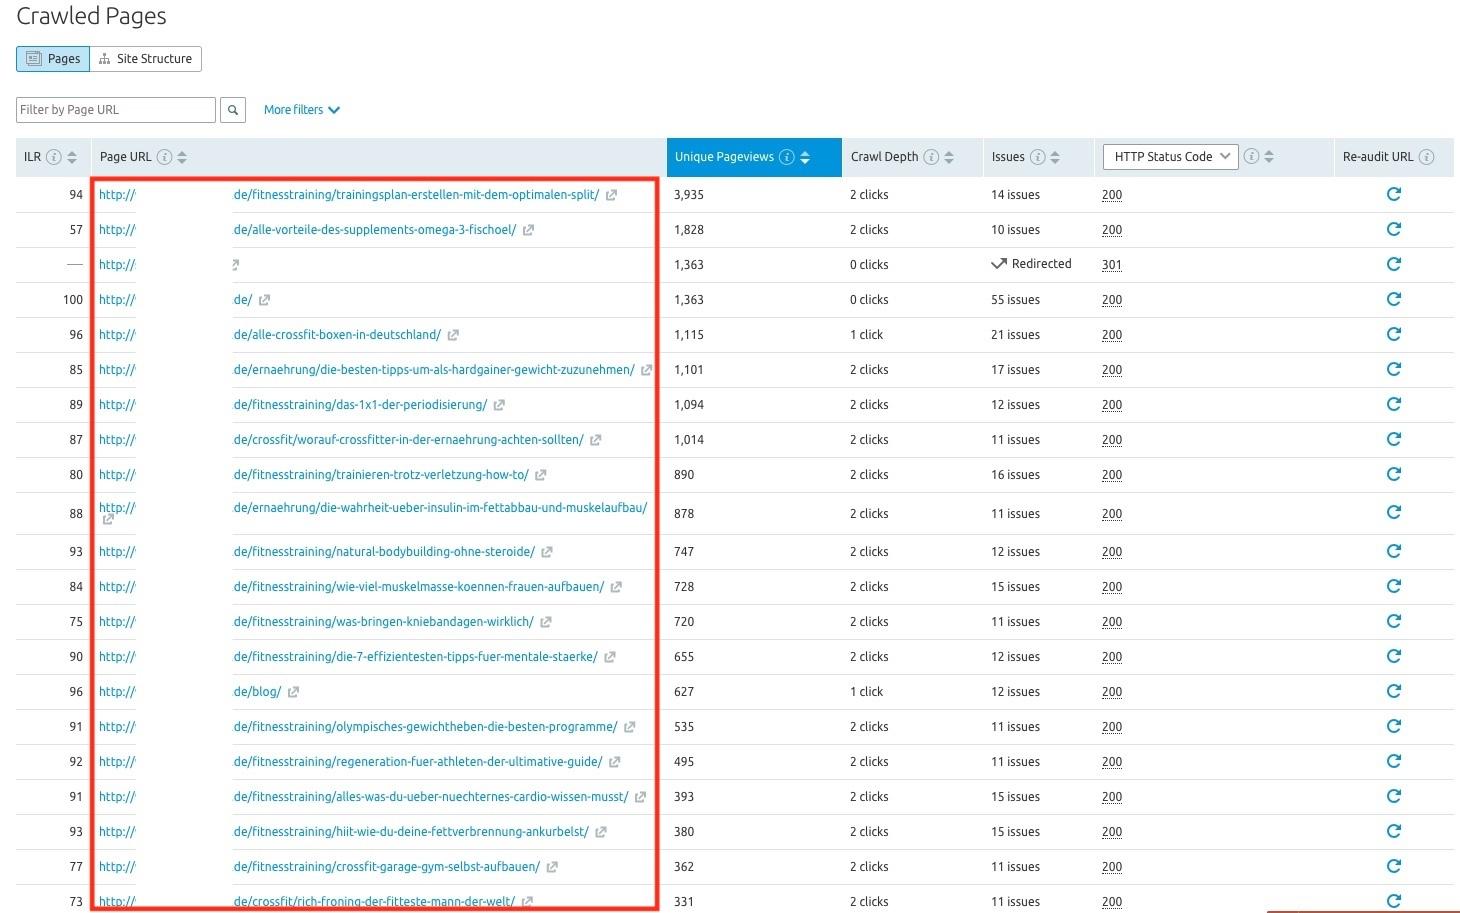 semrush-site-audit-crawled-pages.jpeg